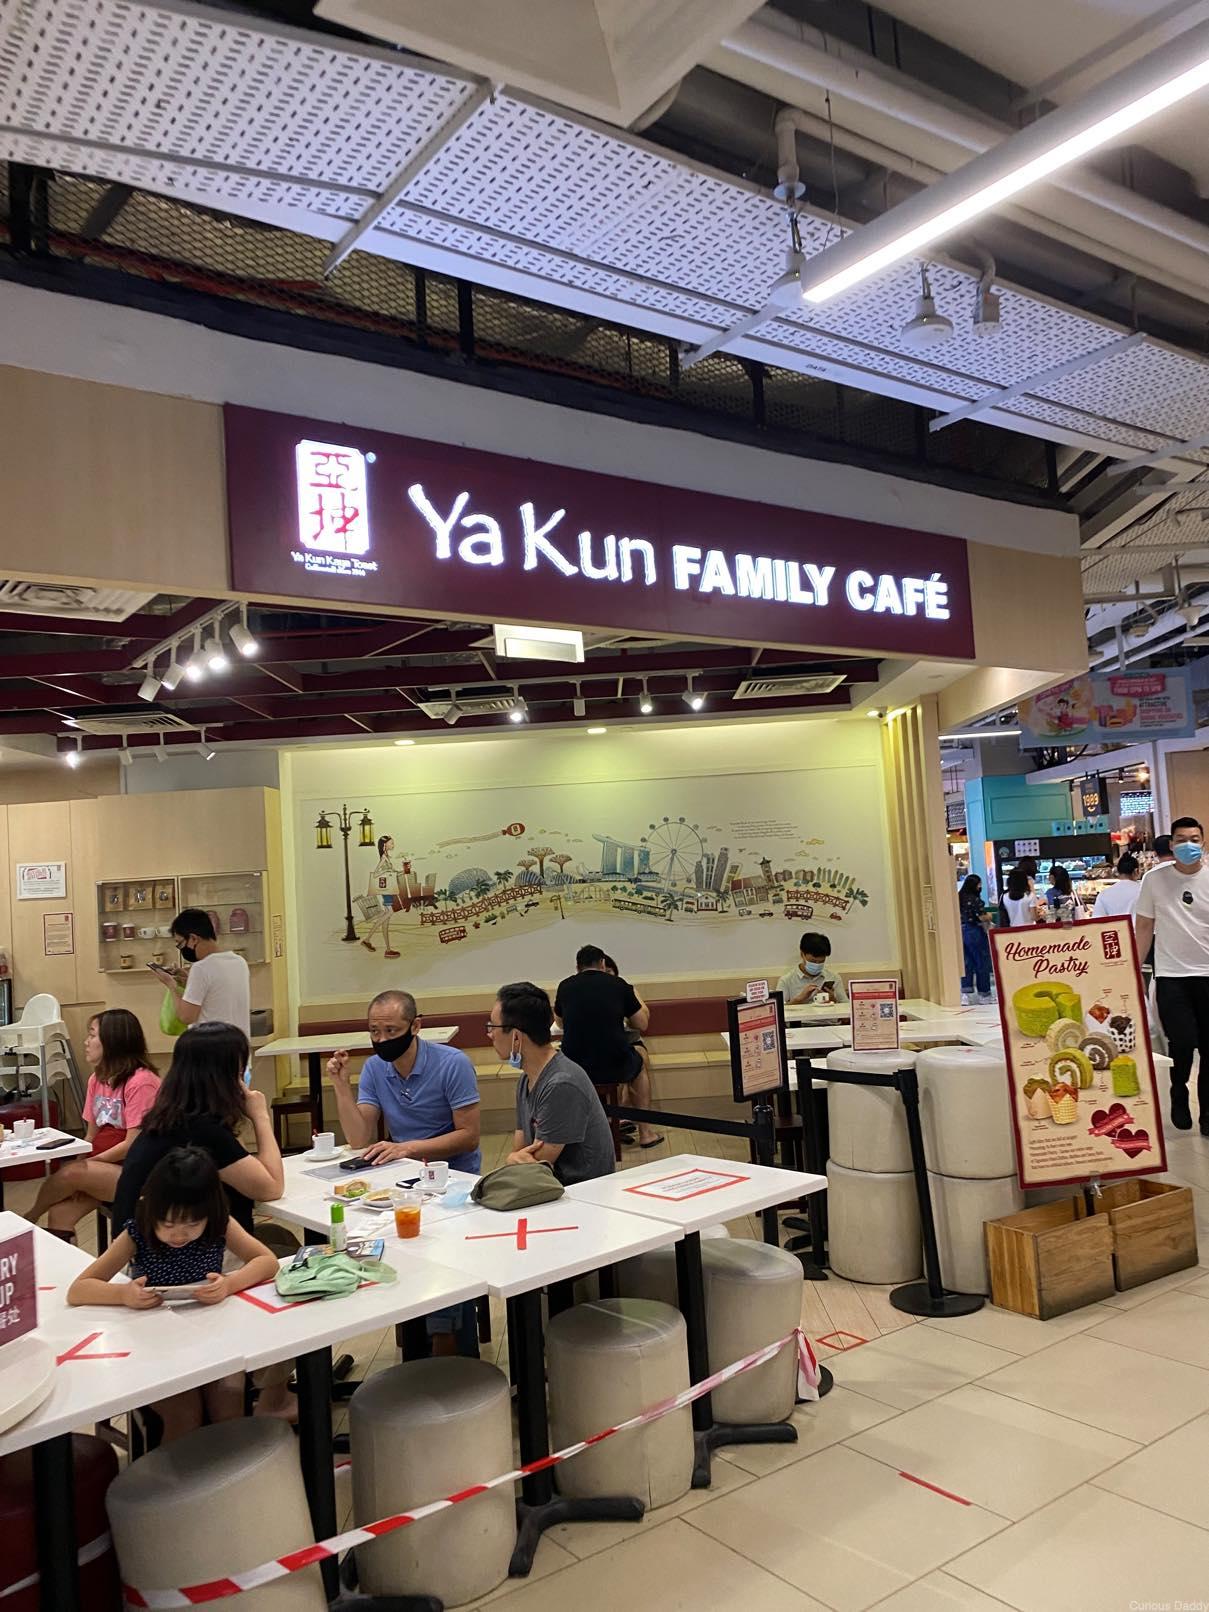 seletar mall Ya Kun